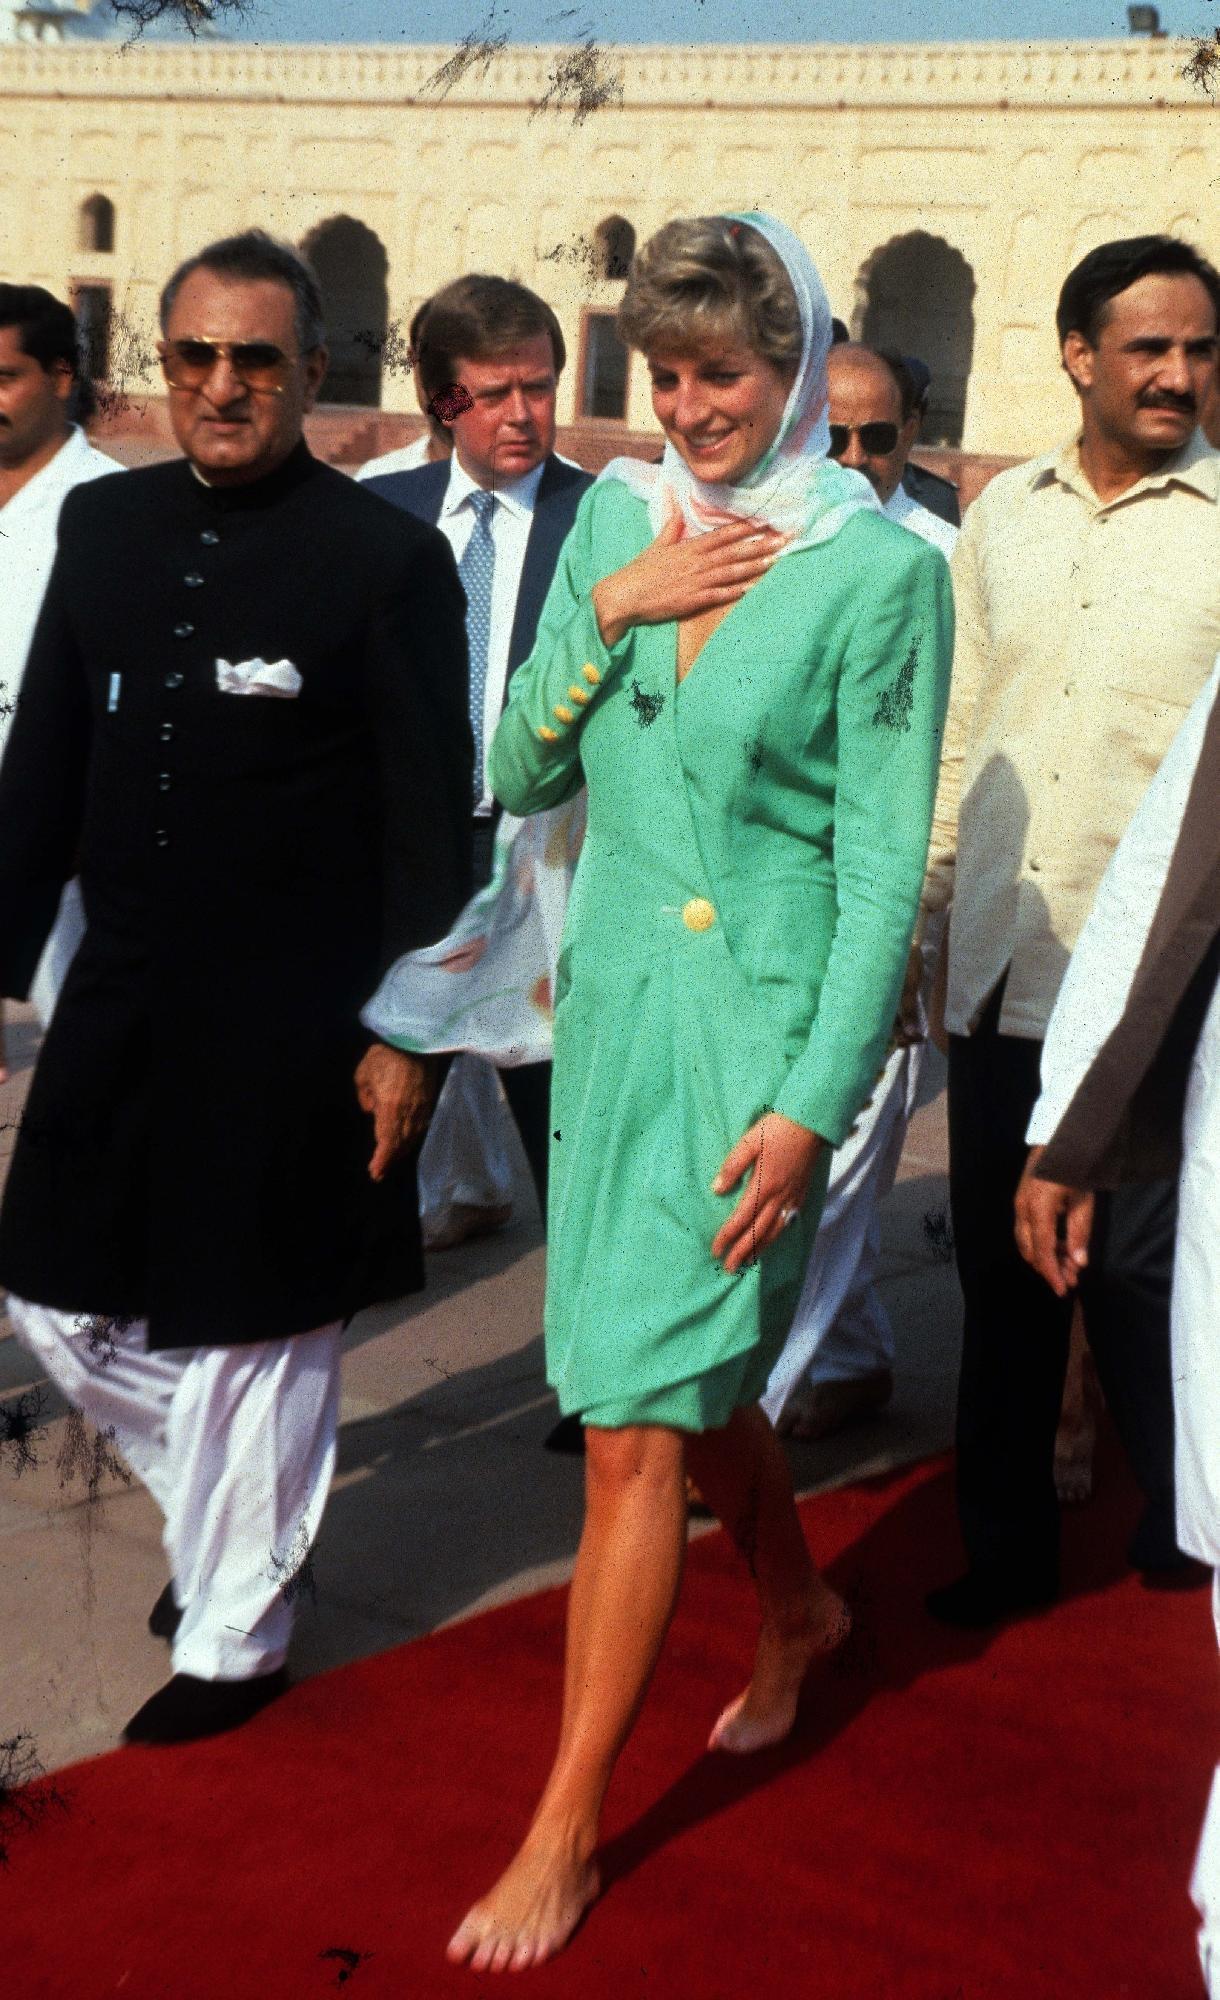 https://pics.wikifeet.com/Princess-Diana-Feet-2694701.jpg